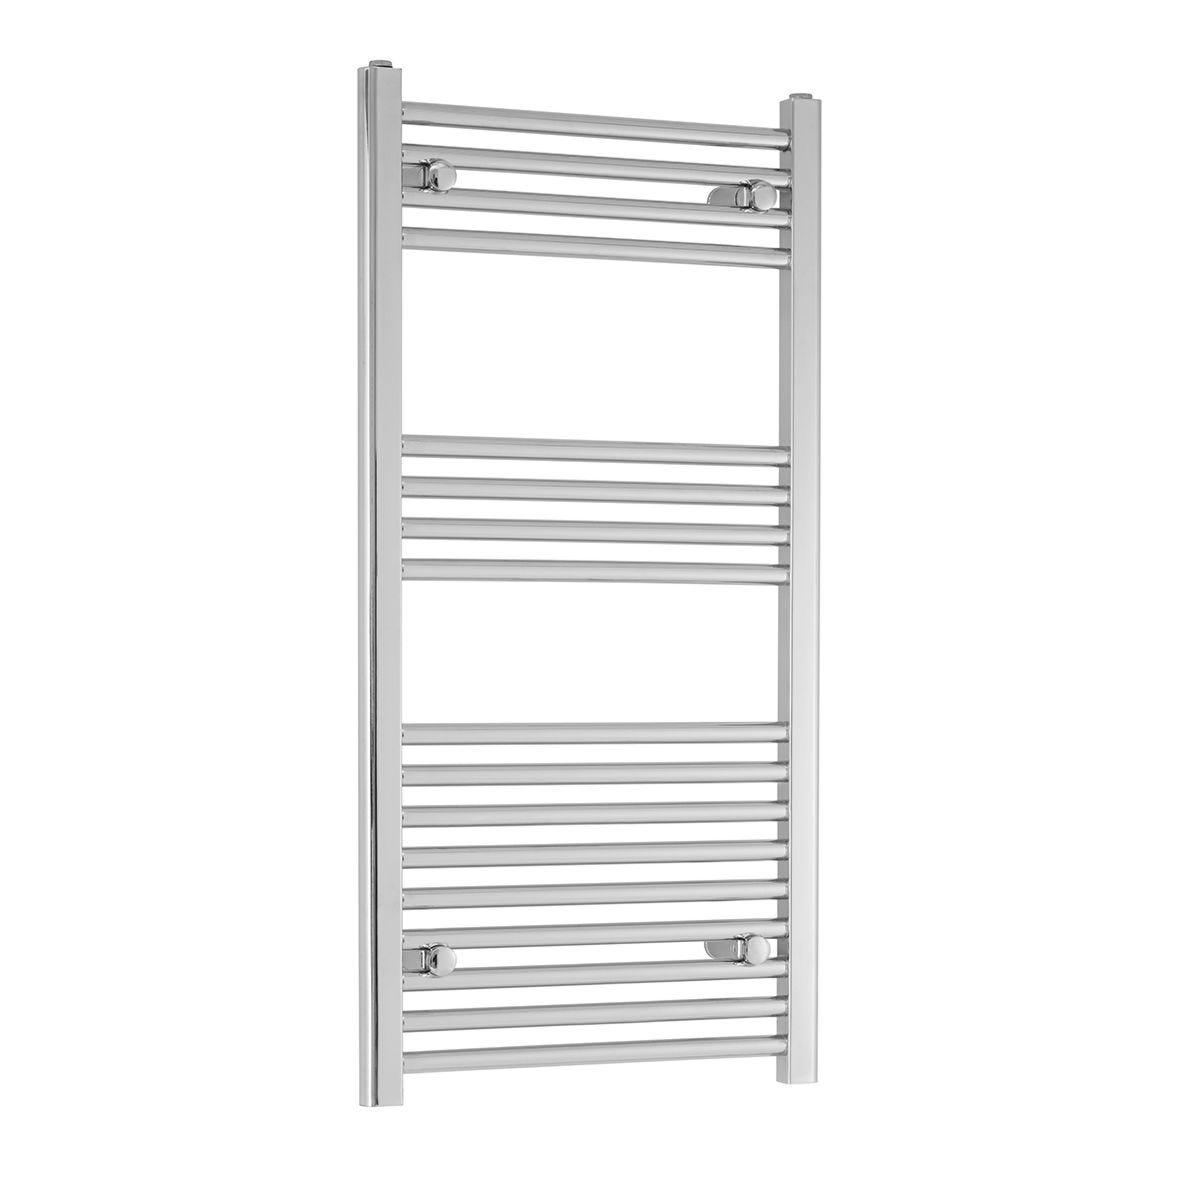 Heating Style Blythe Ladder Rail 1600x500mm Straight - Chrome